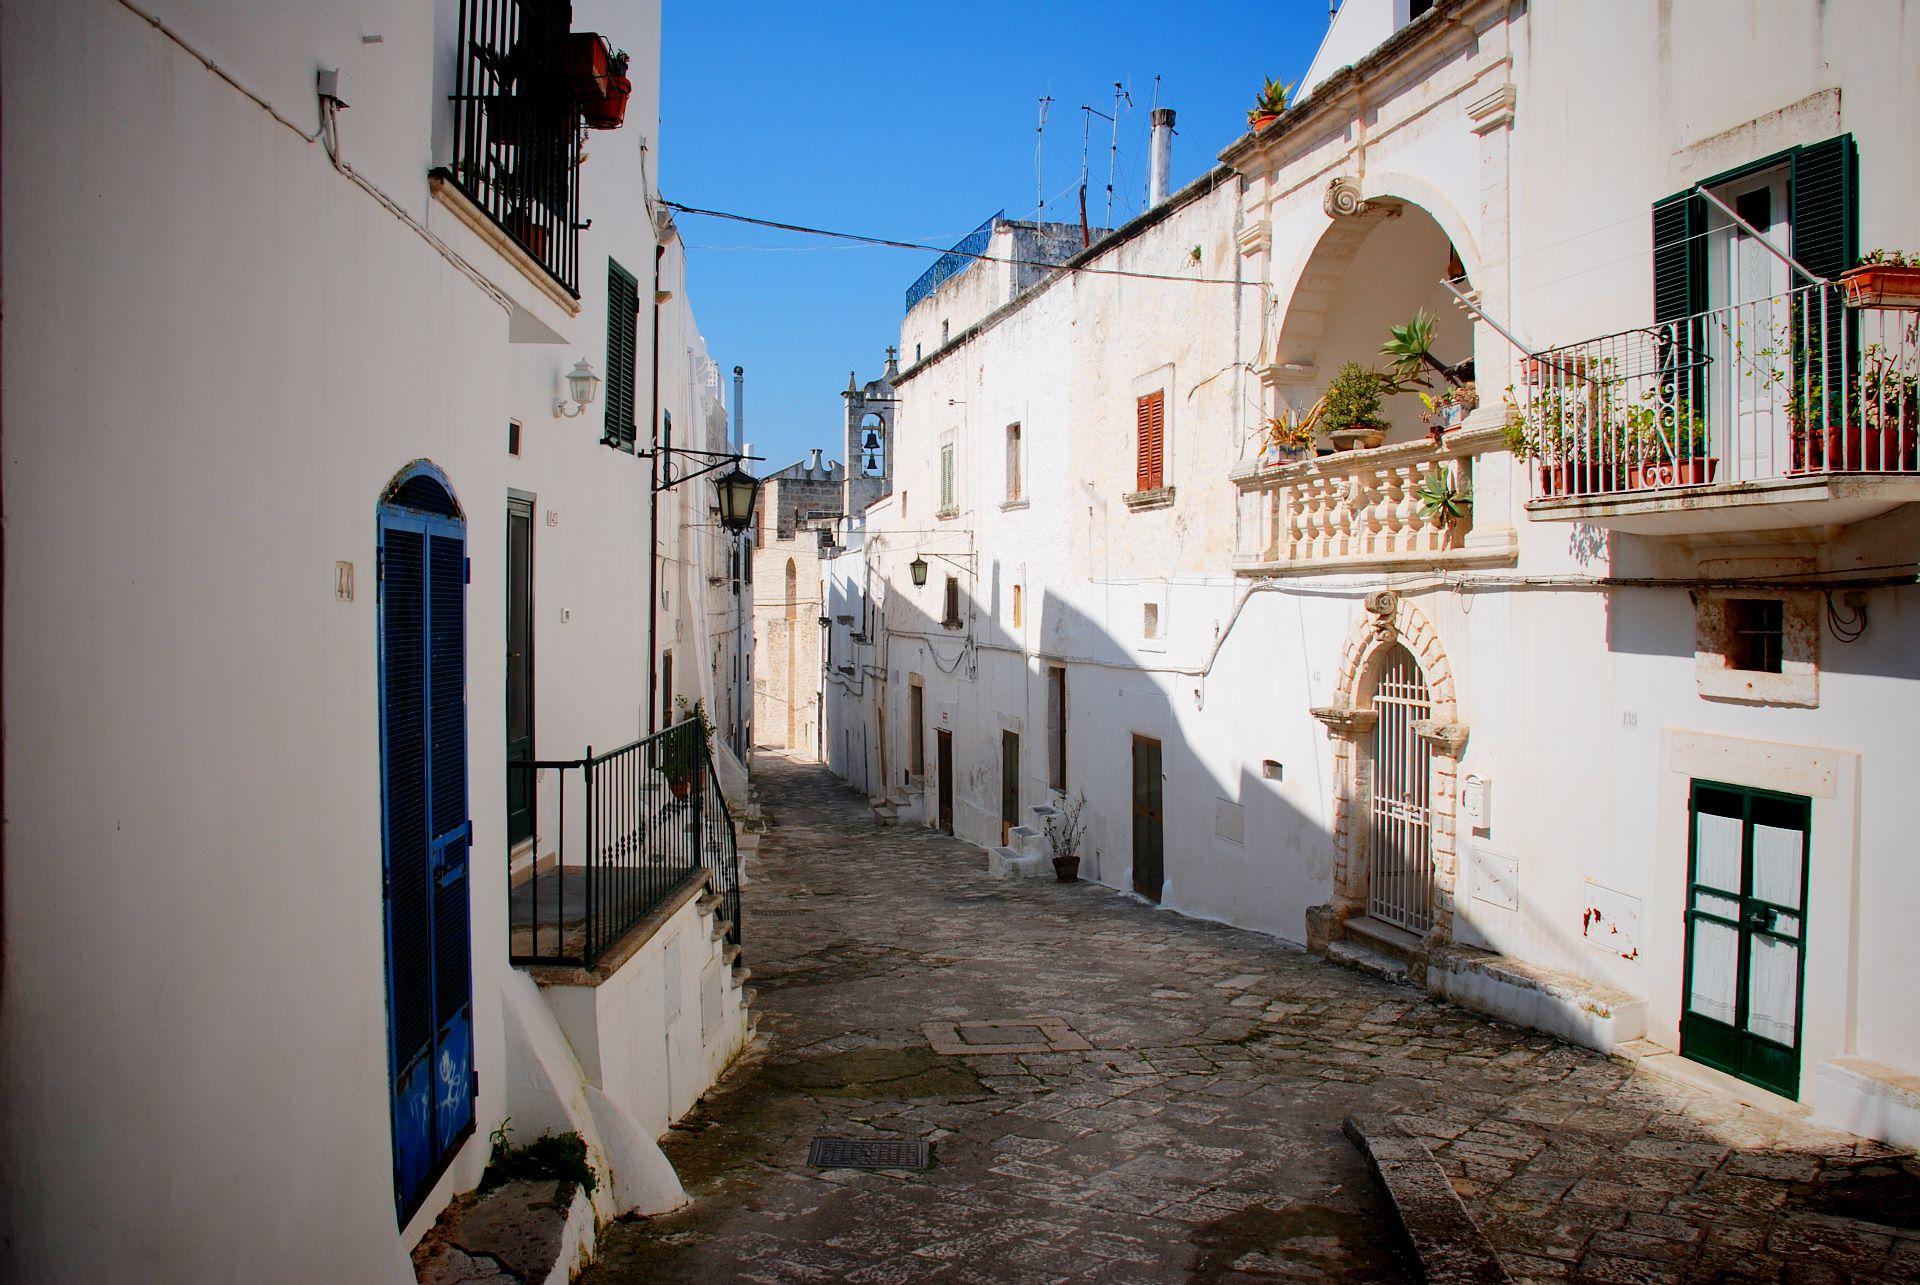 apulia slow travel ostuni citta bianca white city die weiße stadt vicolo salento murgia gasse loggia alley valle d'itria